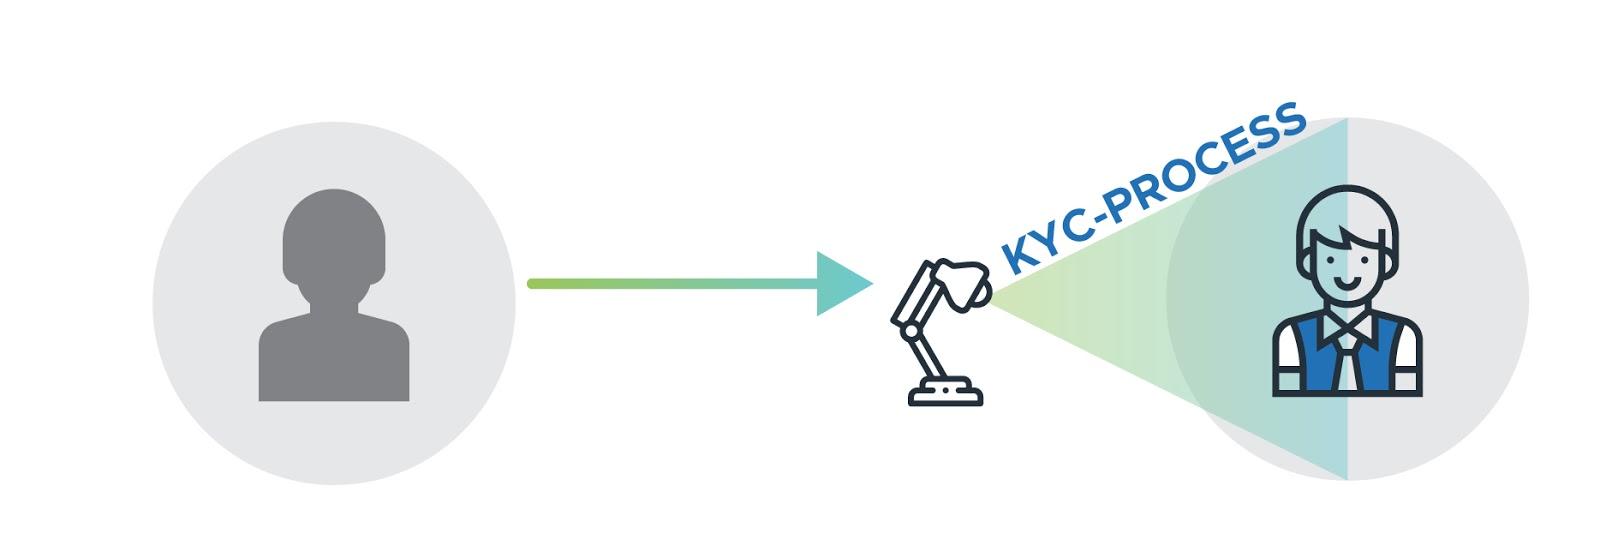 Infographic KYC Process